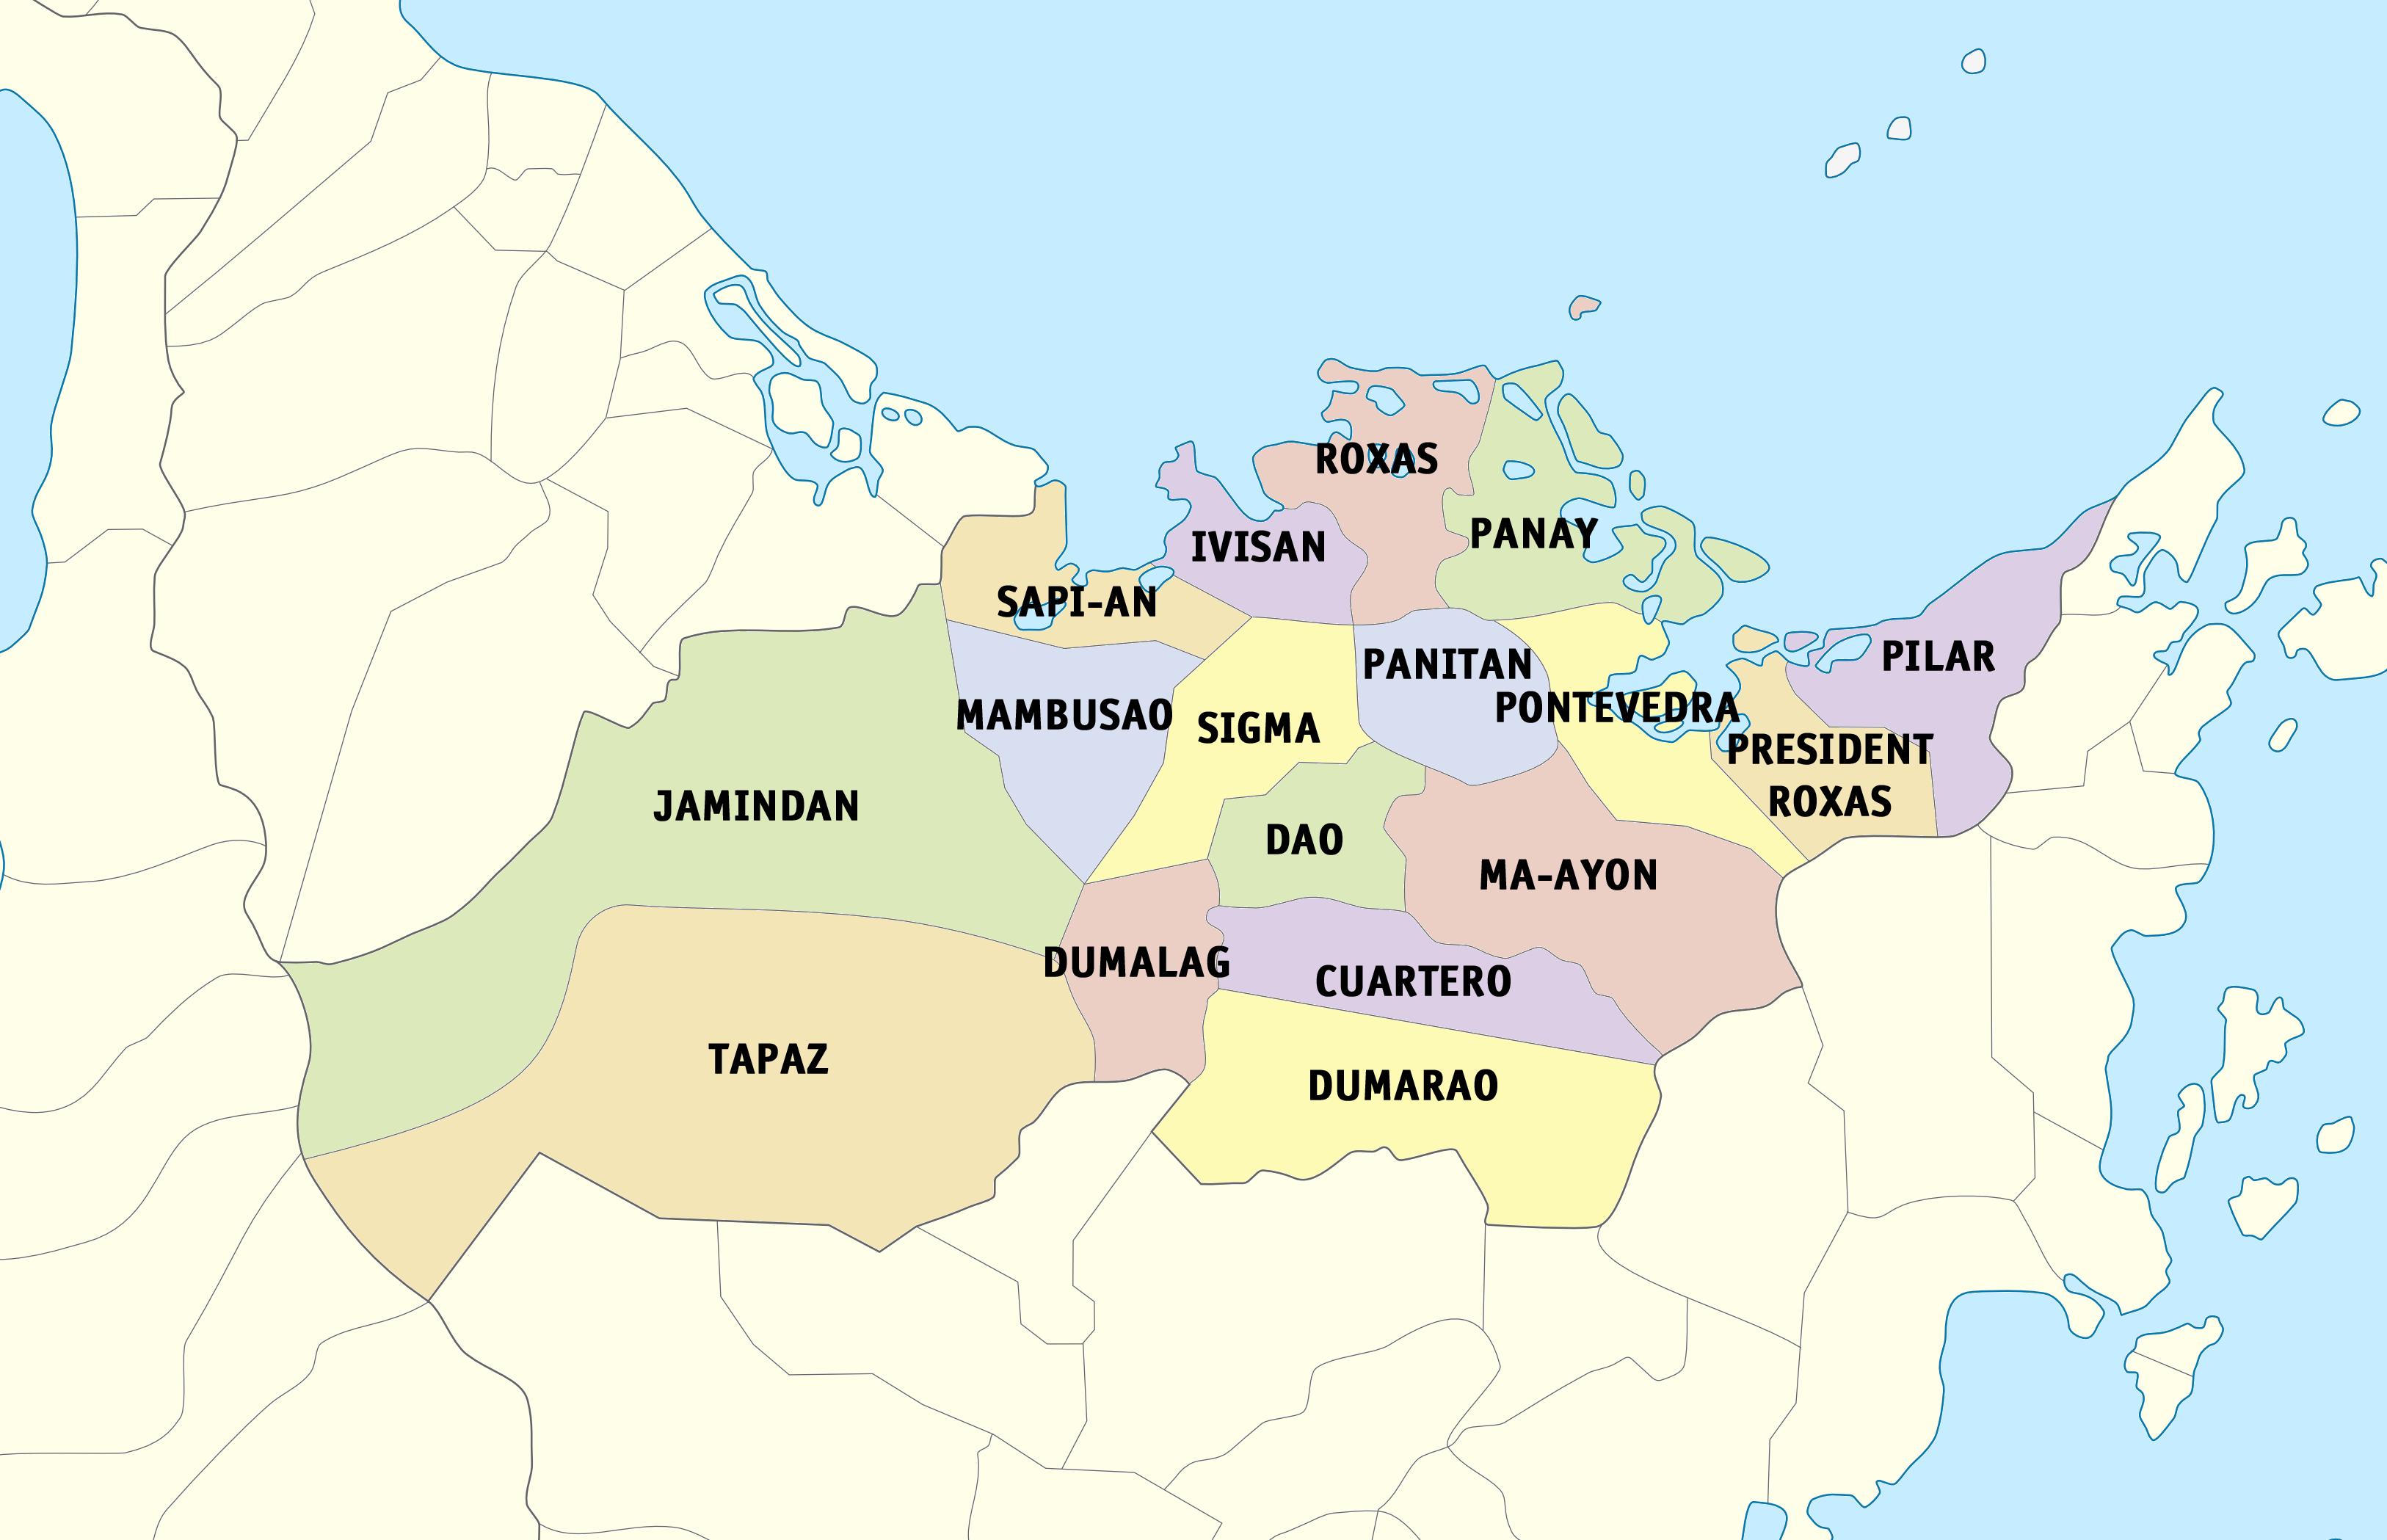 Capiz Wikiwand - Roxas map